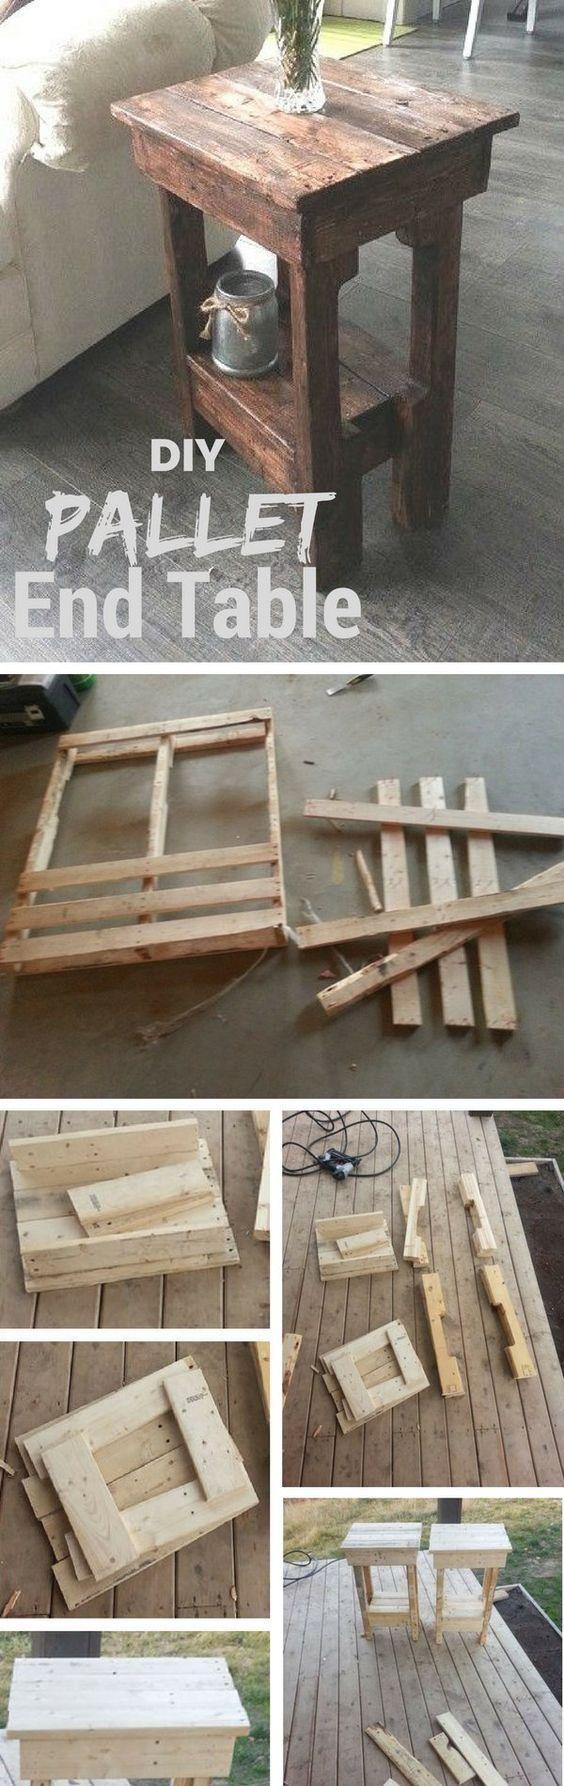 Make this easy DIY end table from pallet wood @istandarddesign #livingroomfurniture